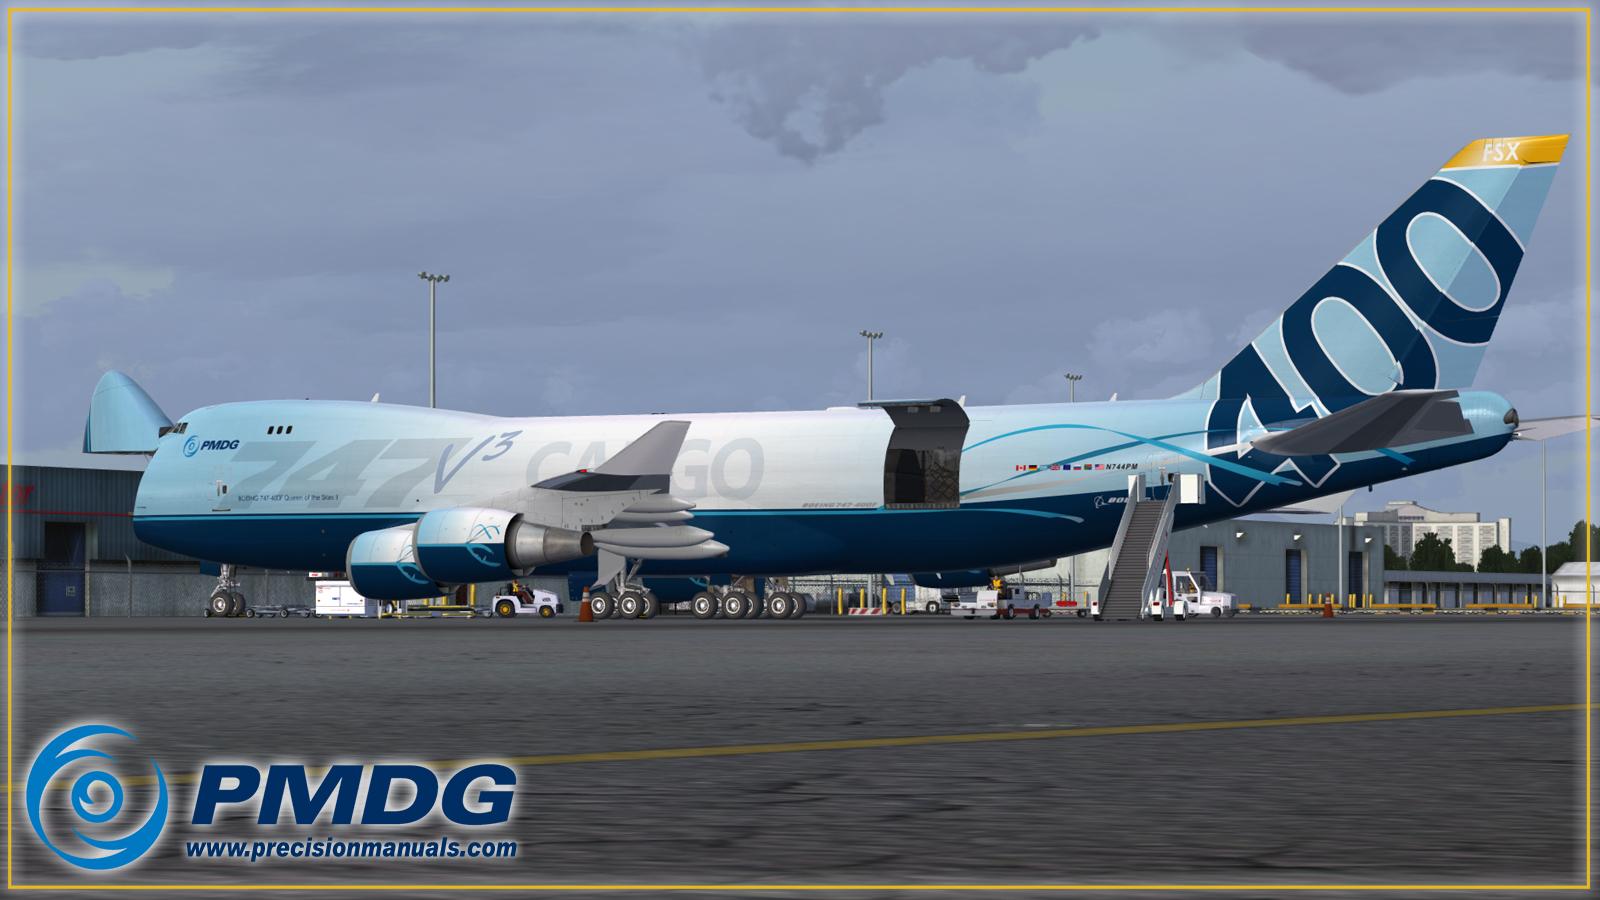 pmdg 747 400 queen of the skies ii 747 400f preview u2022 c aviation rh c aviation net pmdg 737 manual pdf pmdg 737 manual pdf